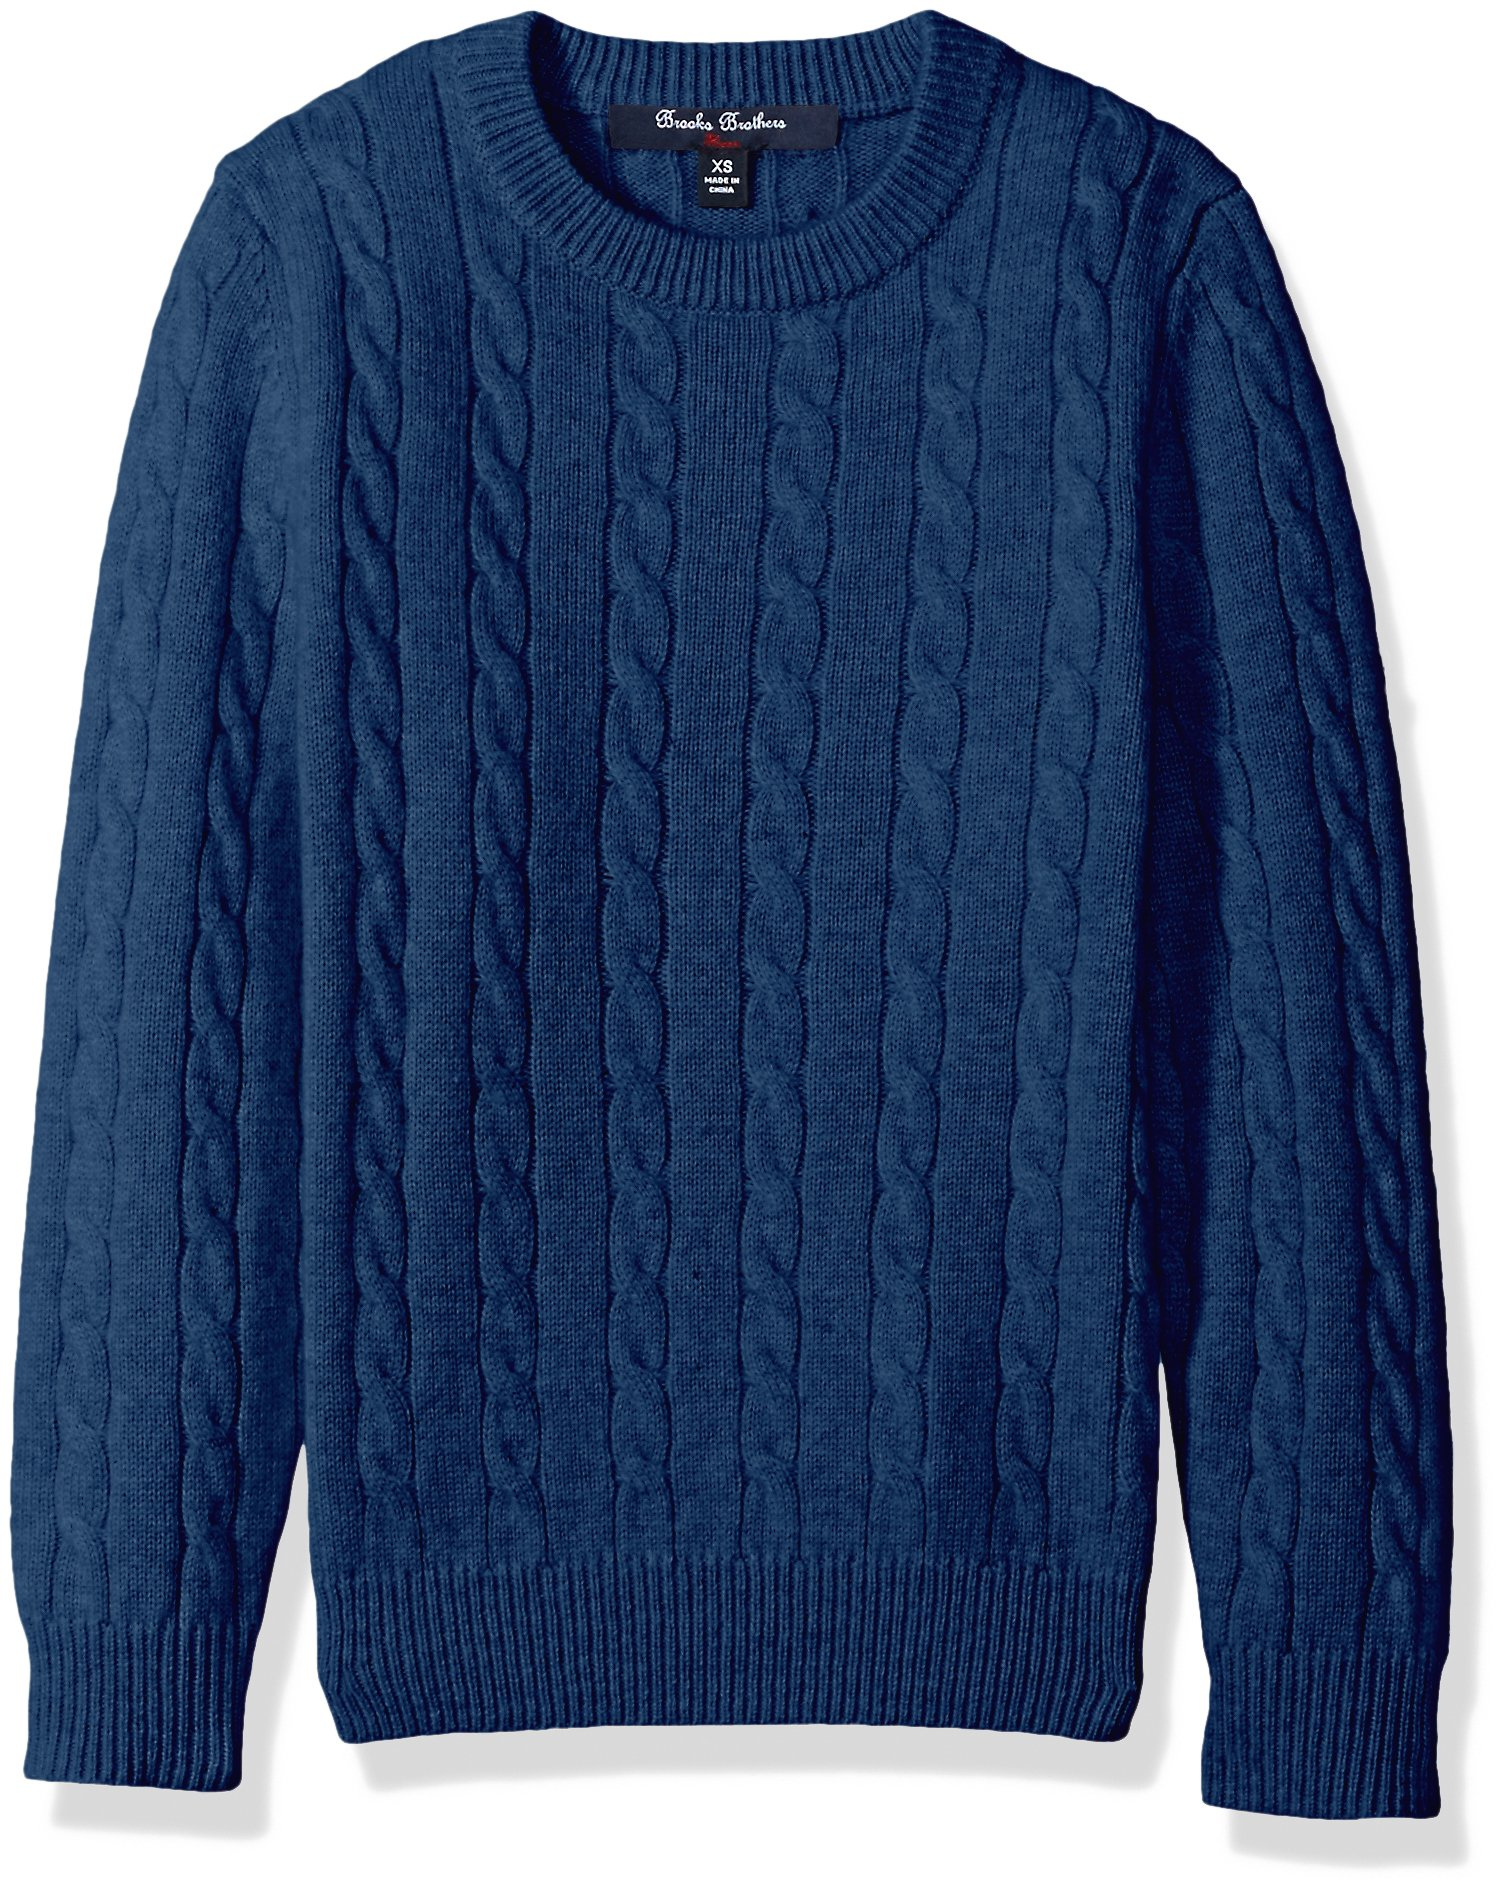 Brooks Brothers Big Boys' Cashmere Crewneck Sweater, Dark Blue, Medium